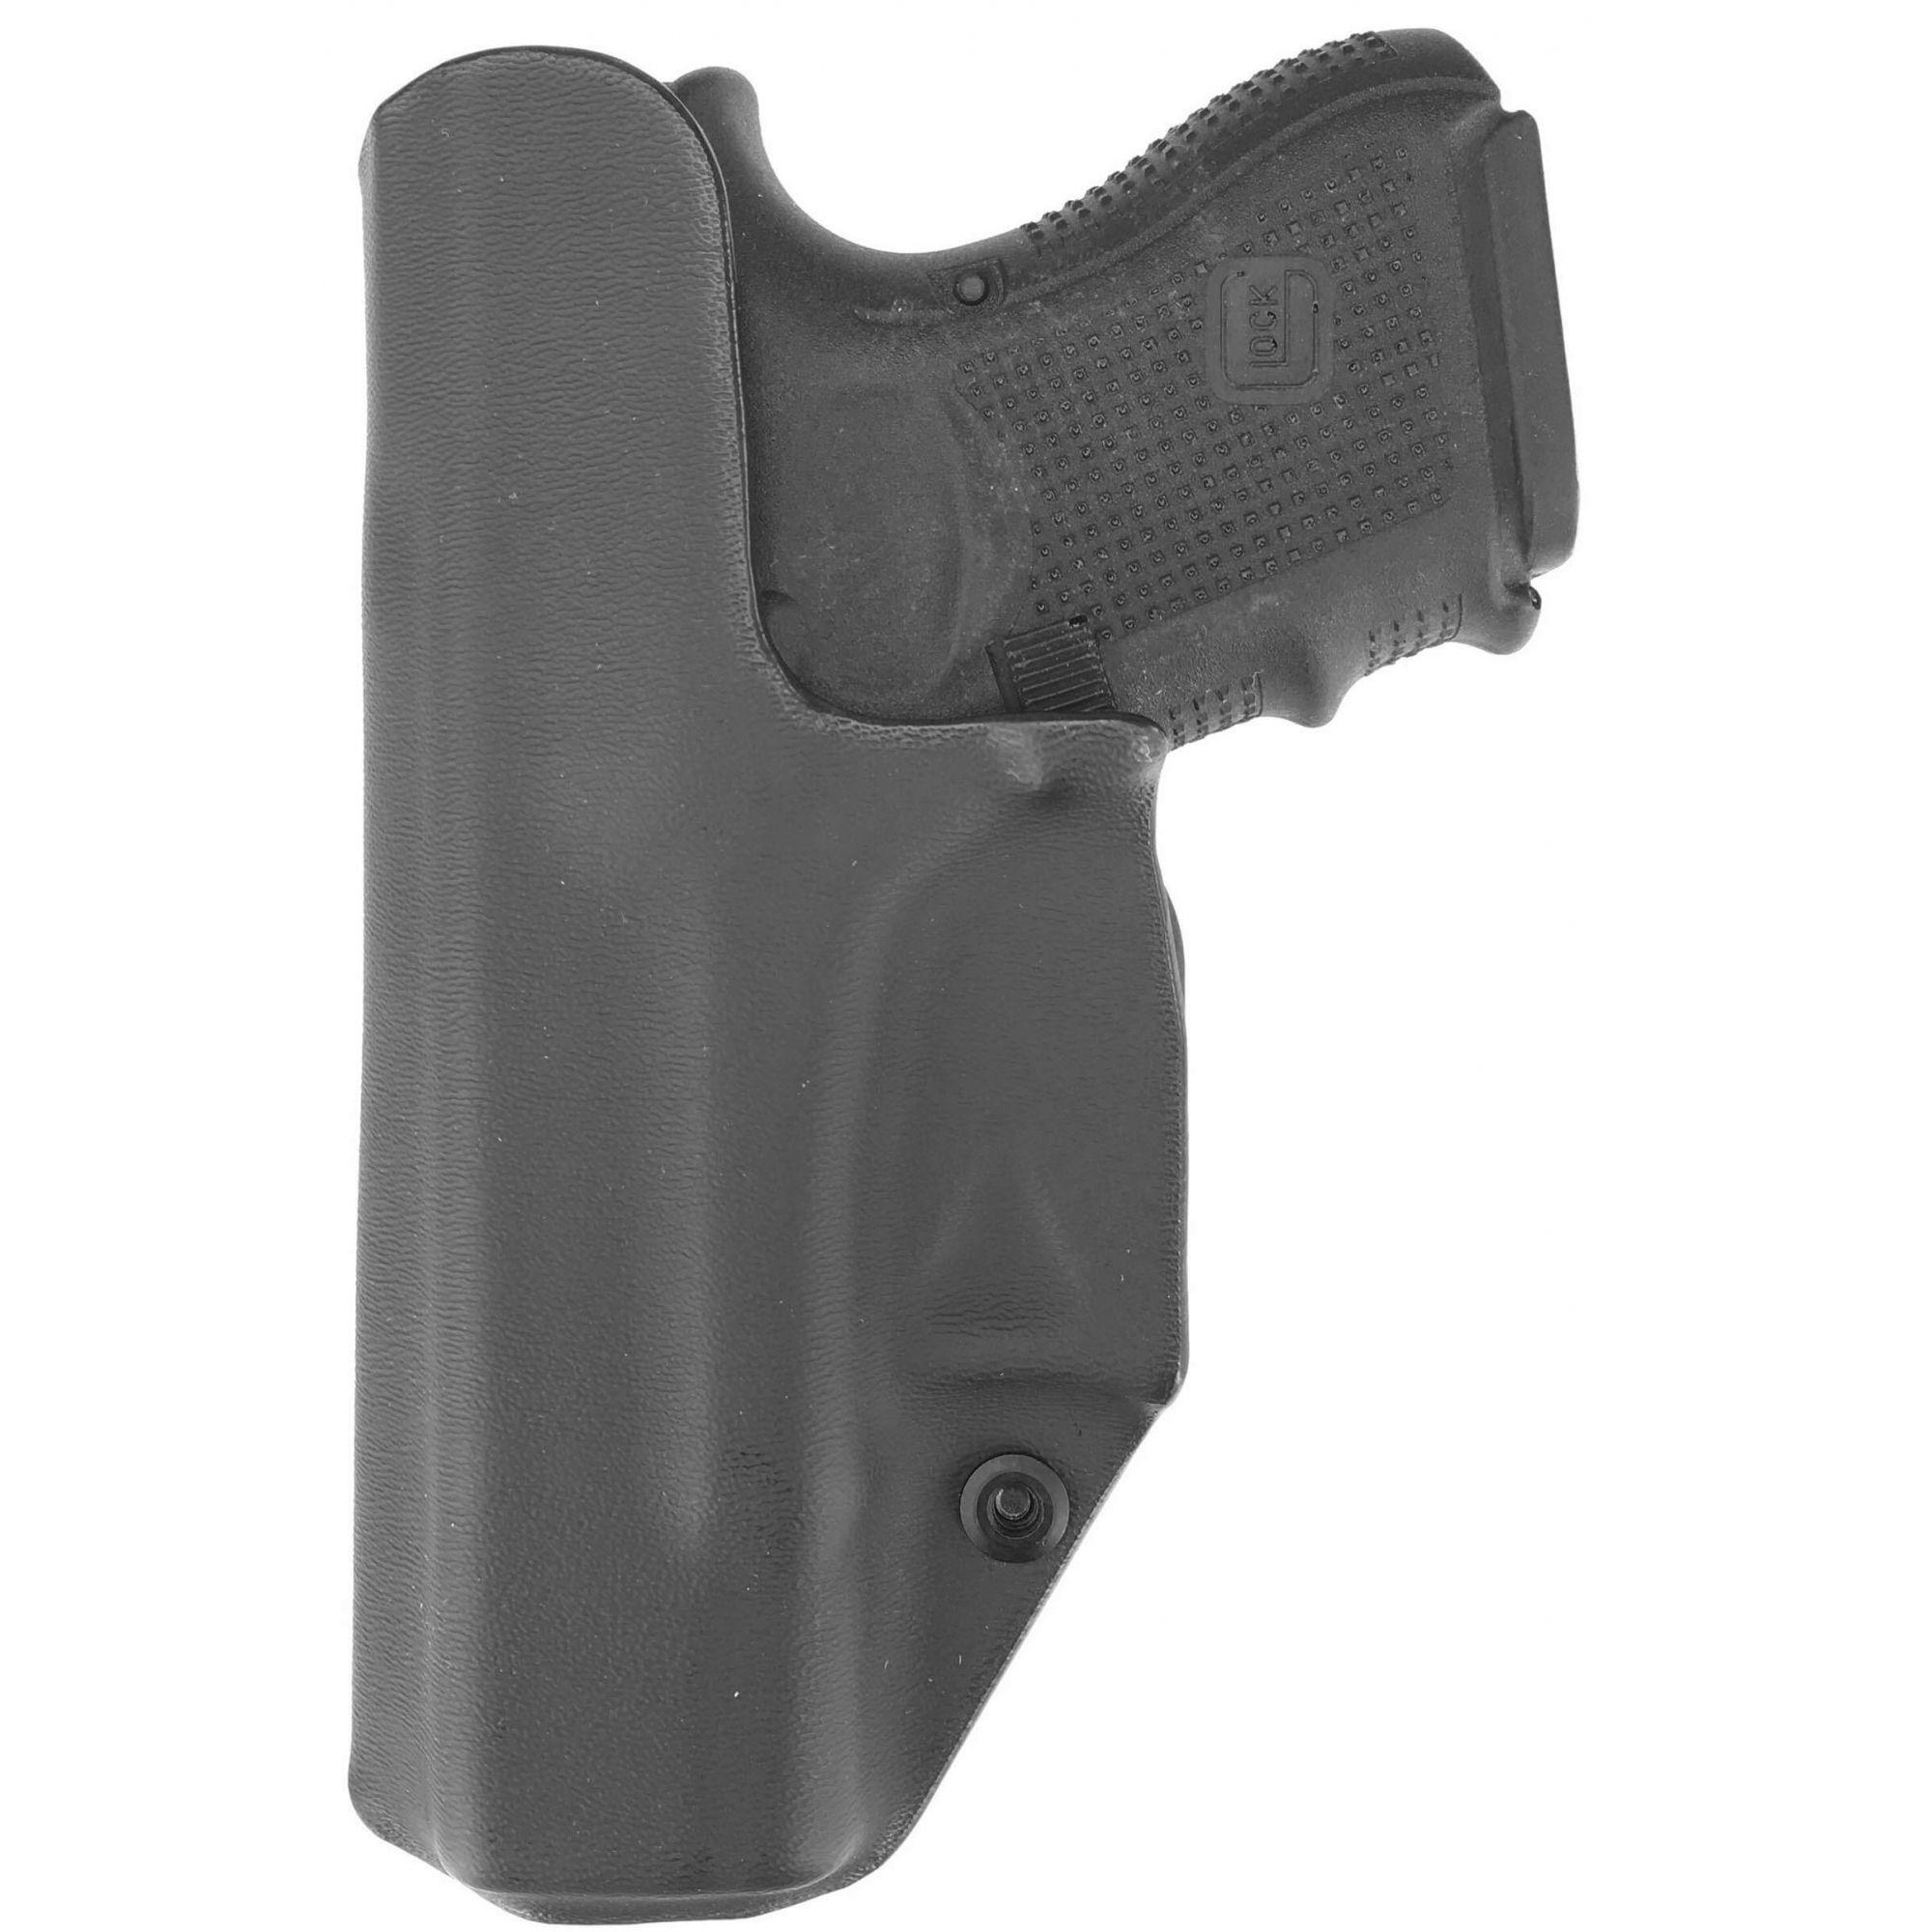 Coldre Slim G28 G26 G27 G33 Glock Saque Rápido Velado Kydex® 080